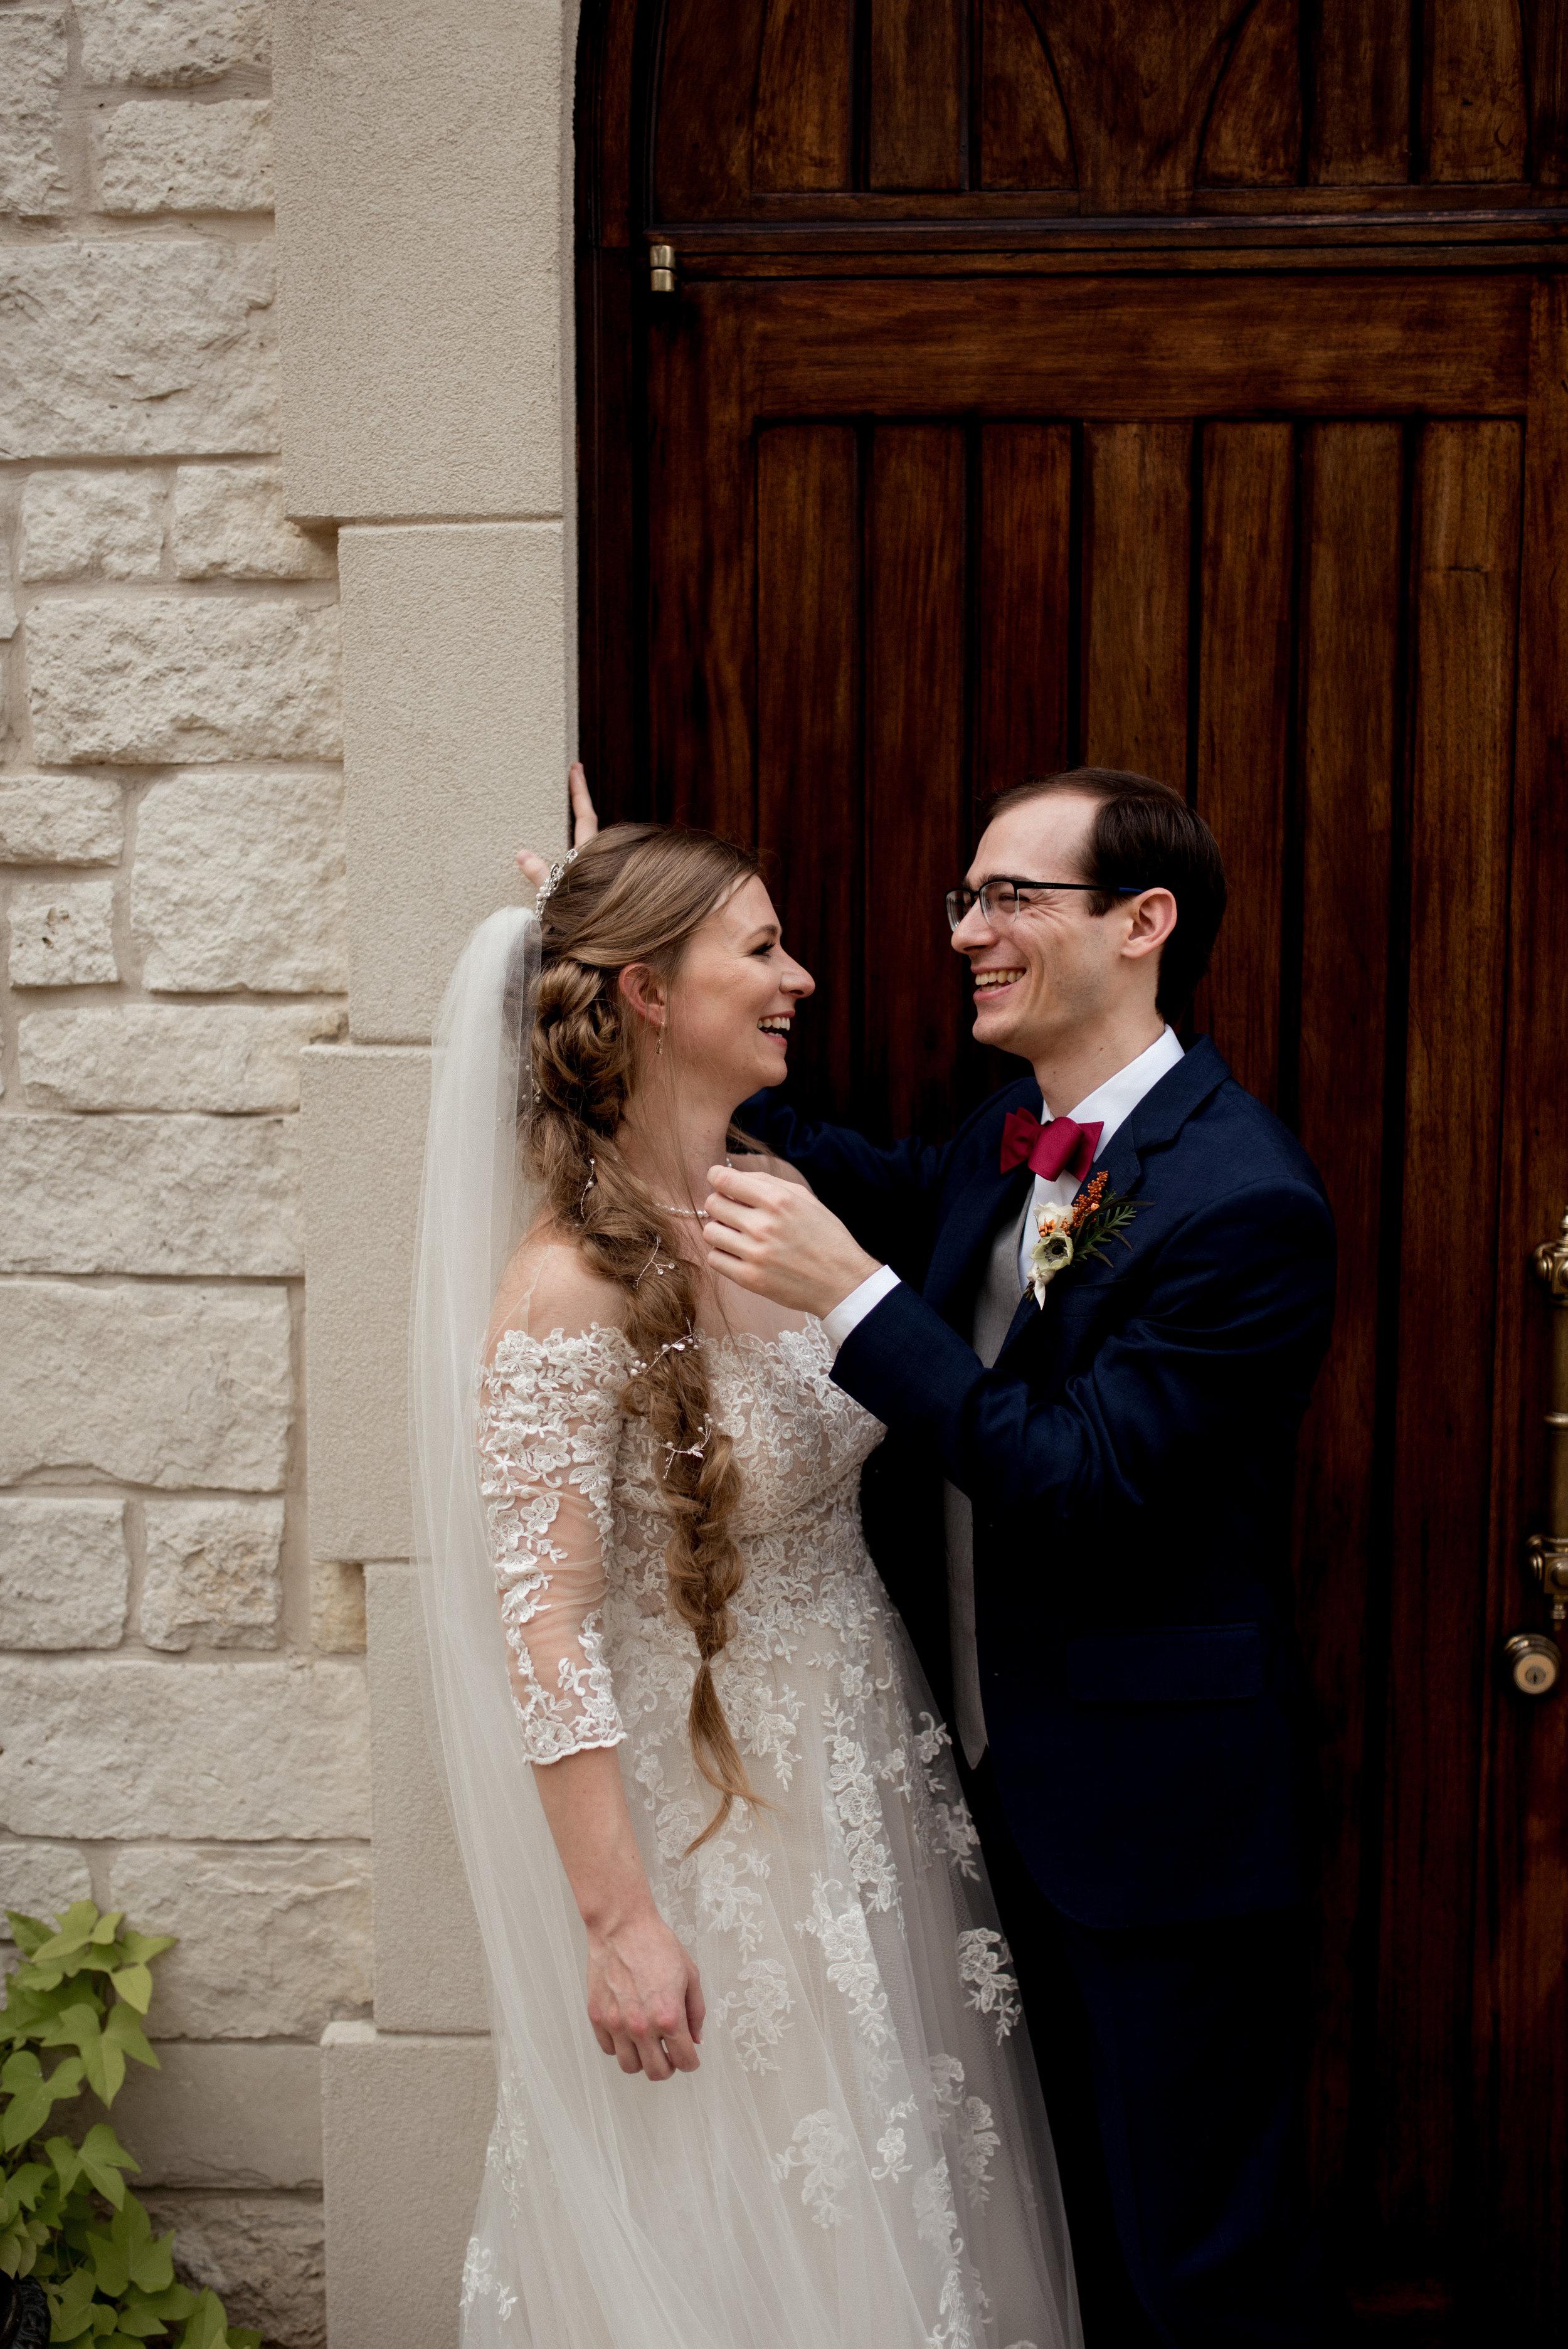 Artigues Wedding-237.jpg